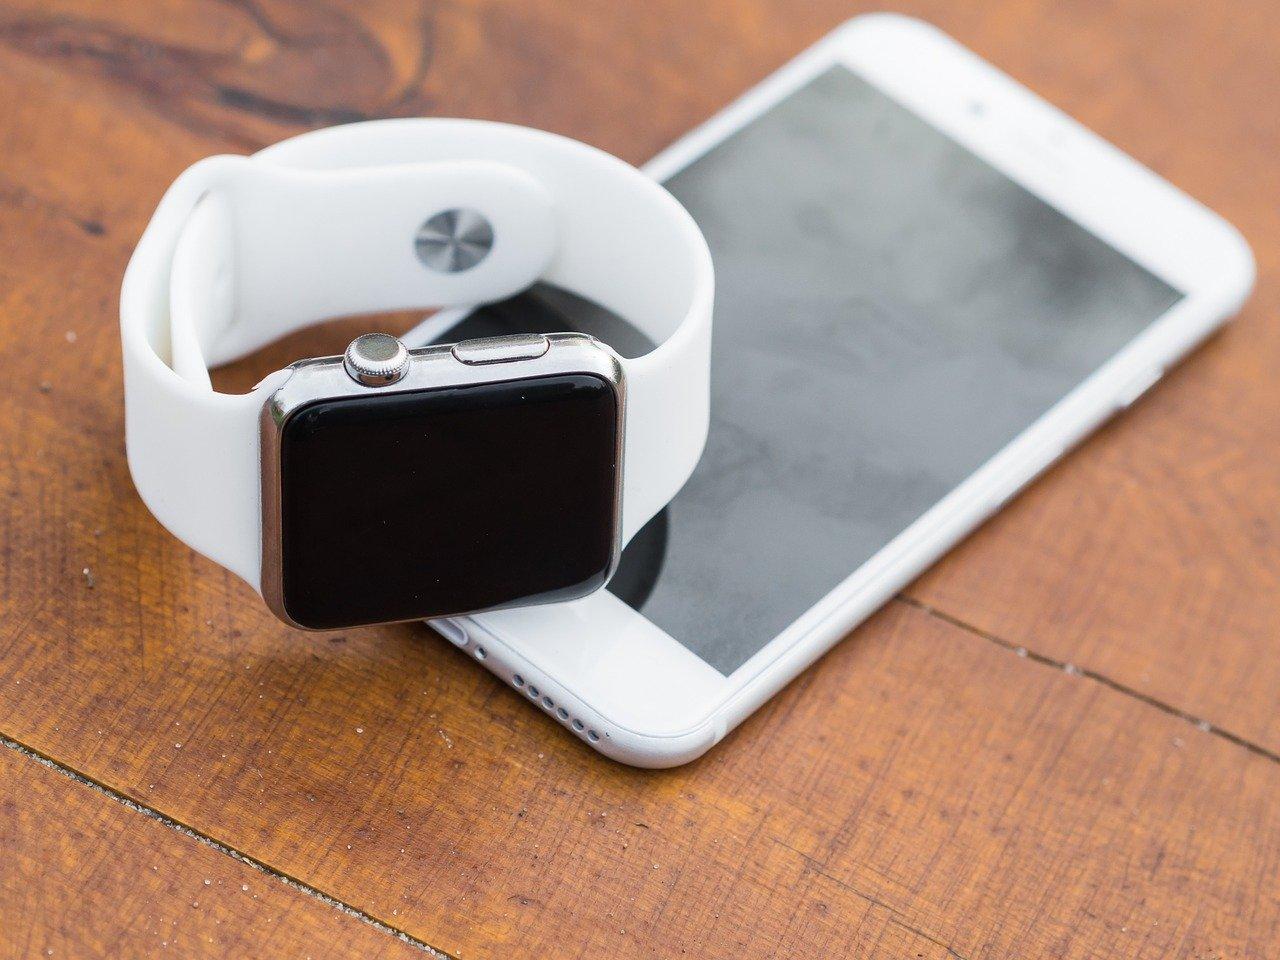 iphone, iwatch, smartphone